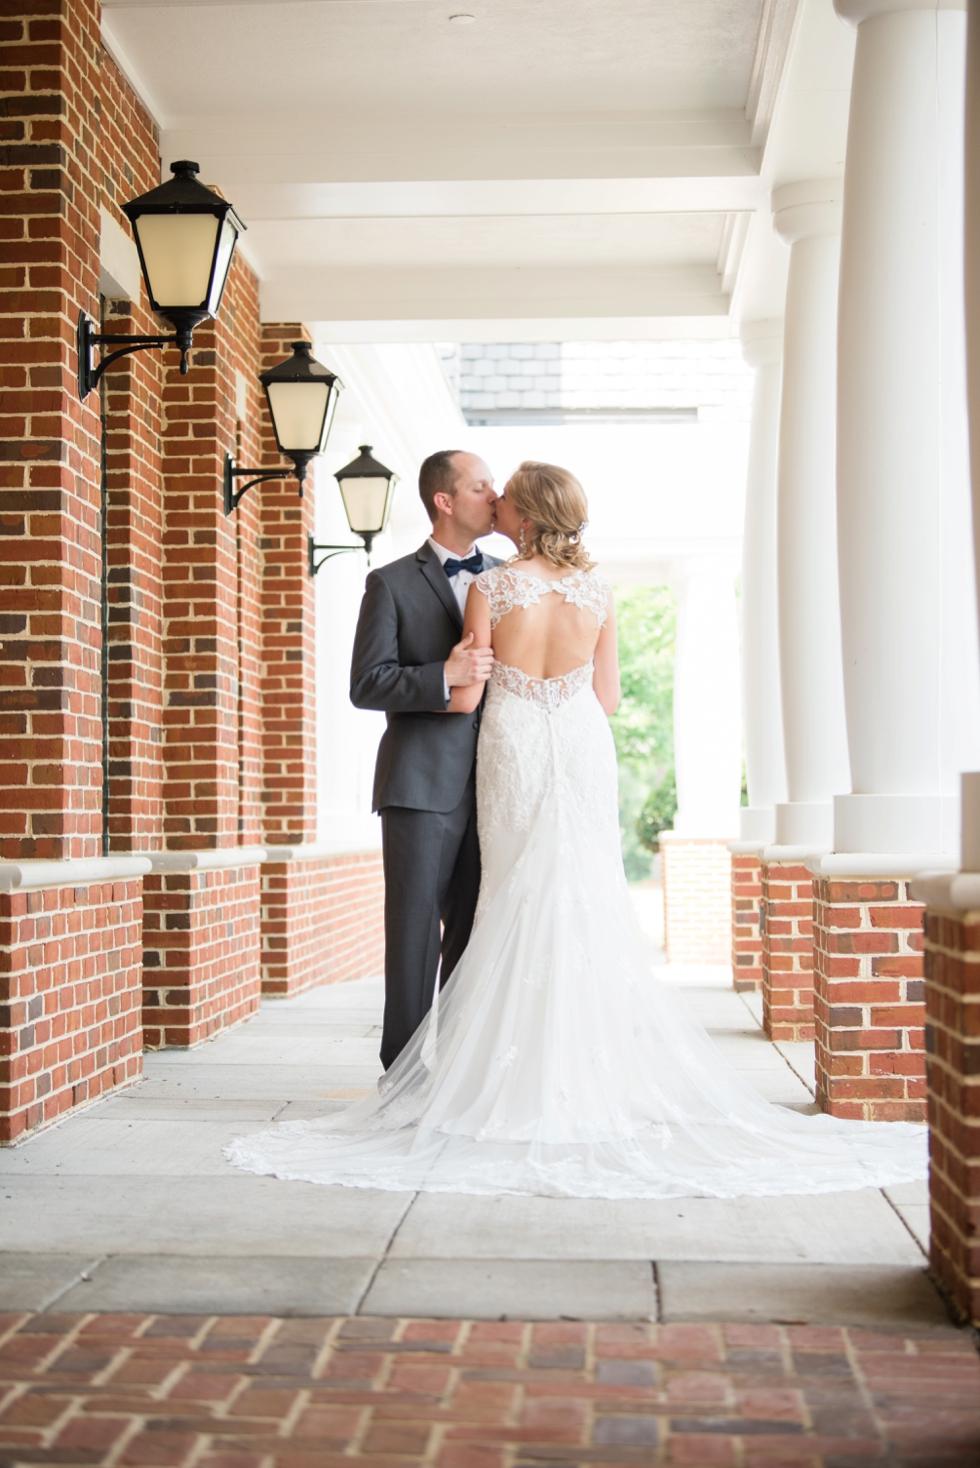 Tiffany's Bridal Richmond VA - Two Rivers Country Club Wedding photography